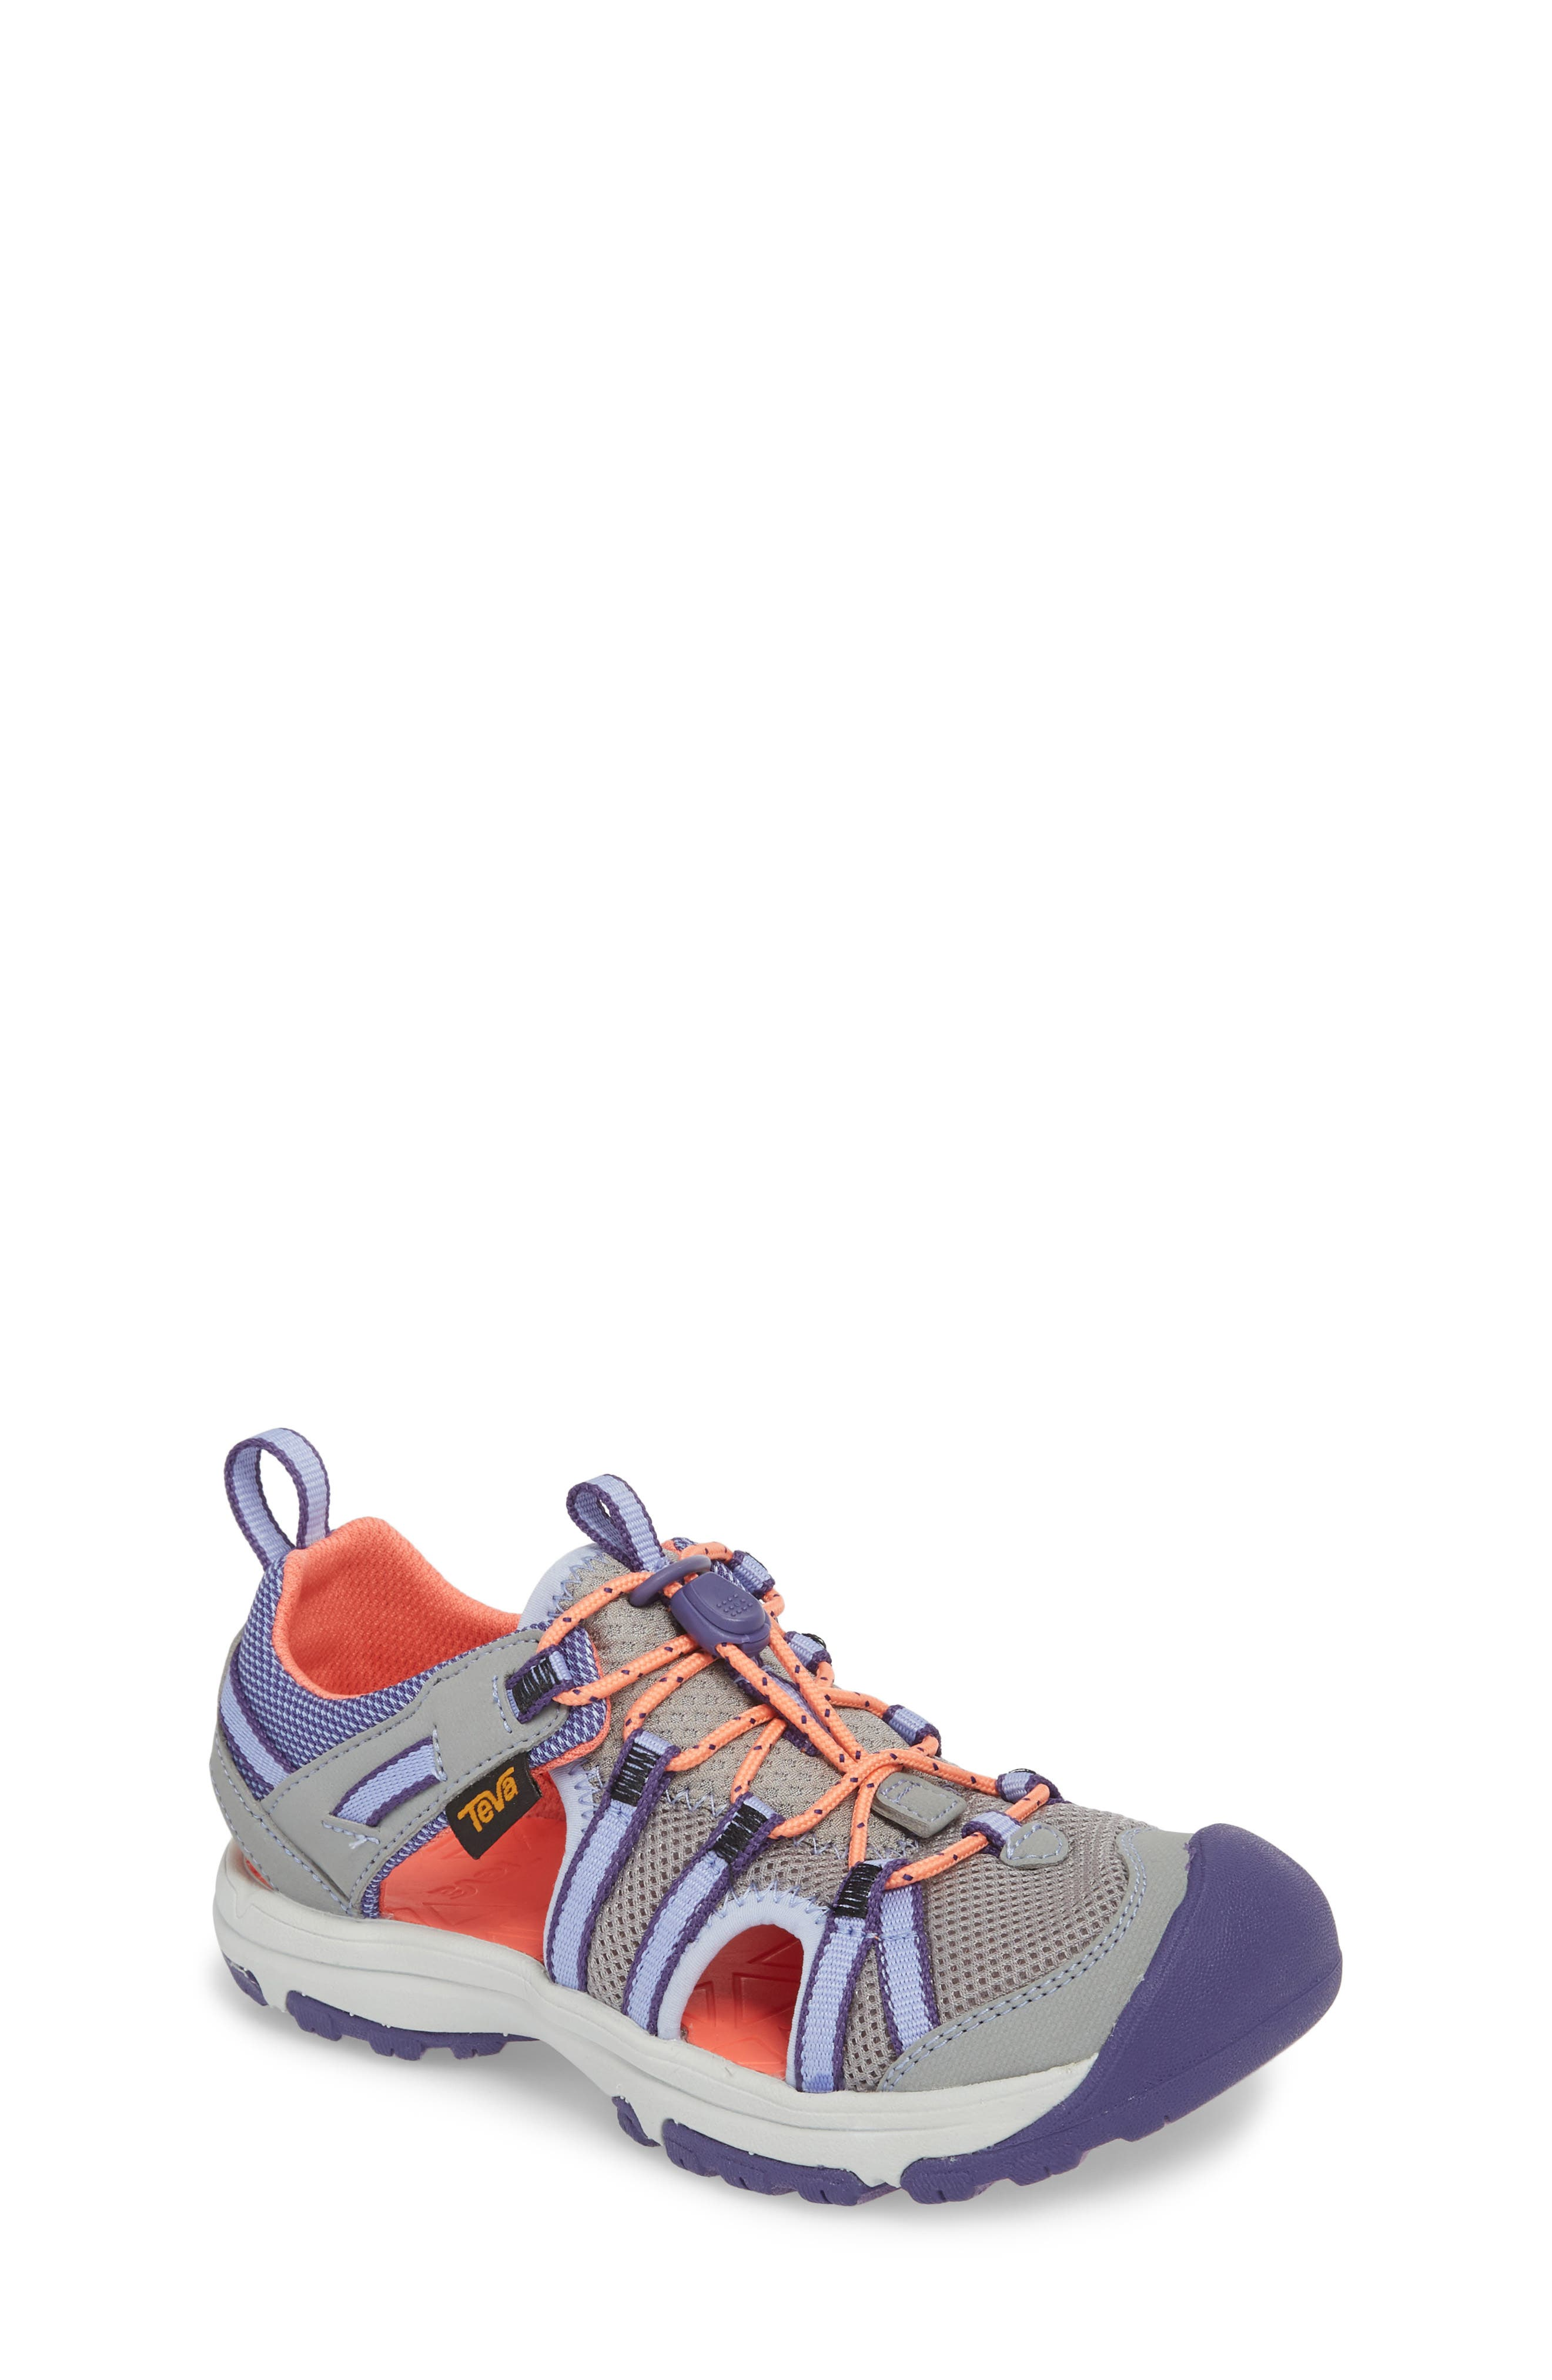 Manatee Sport Sandal,                             Main thumbnail 1, color,                             Wild Dove